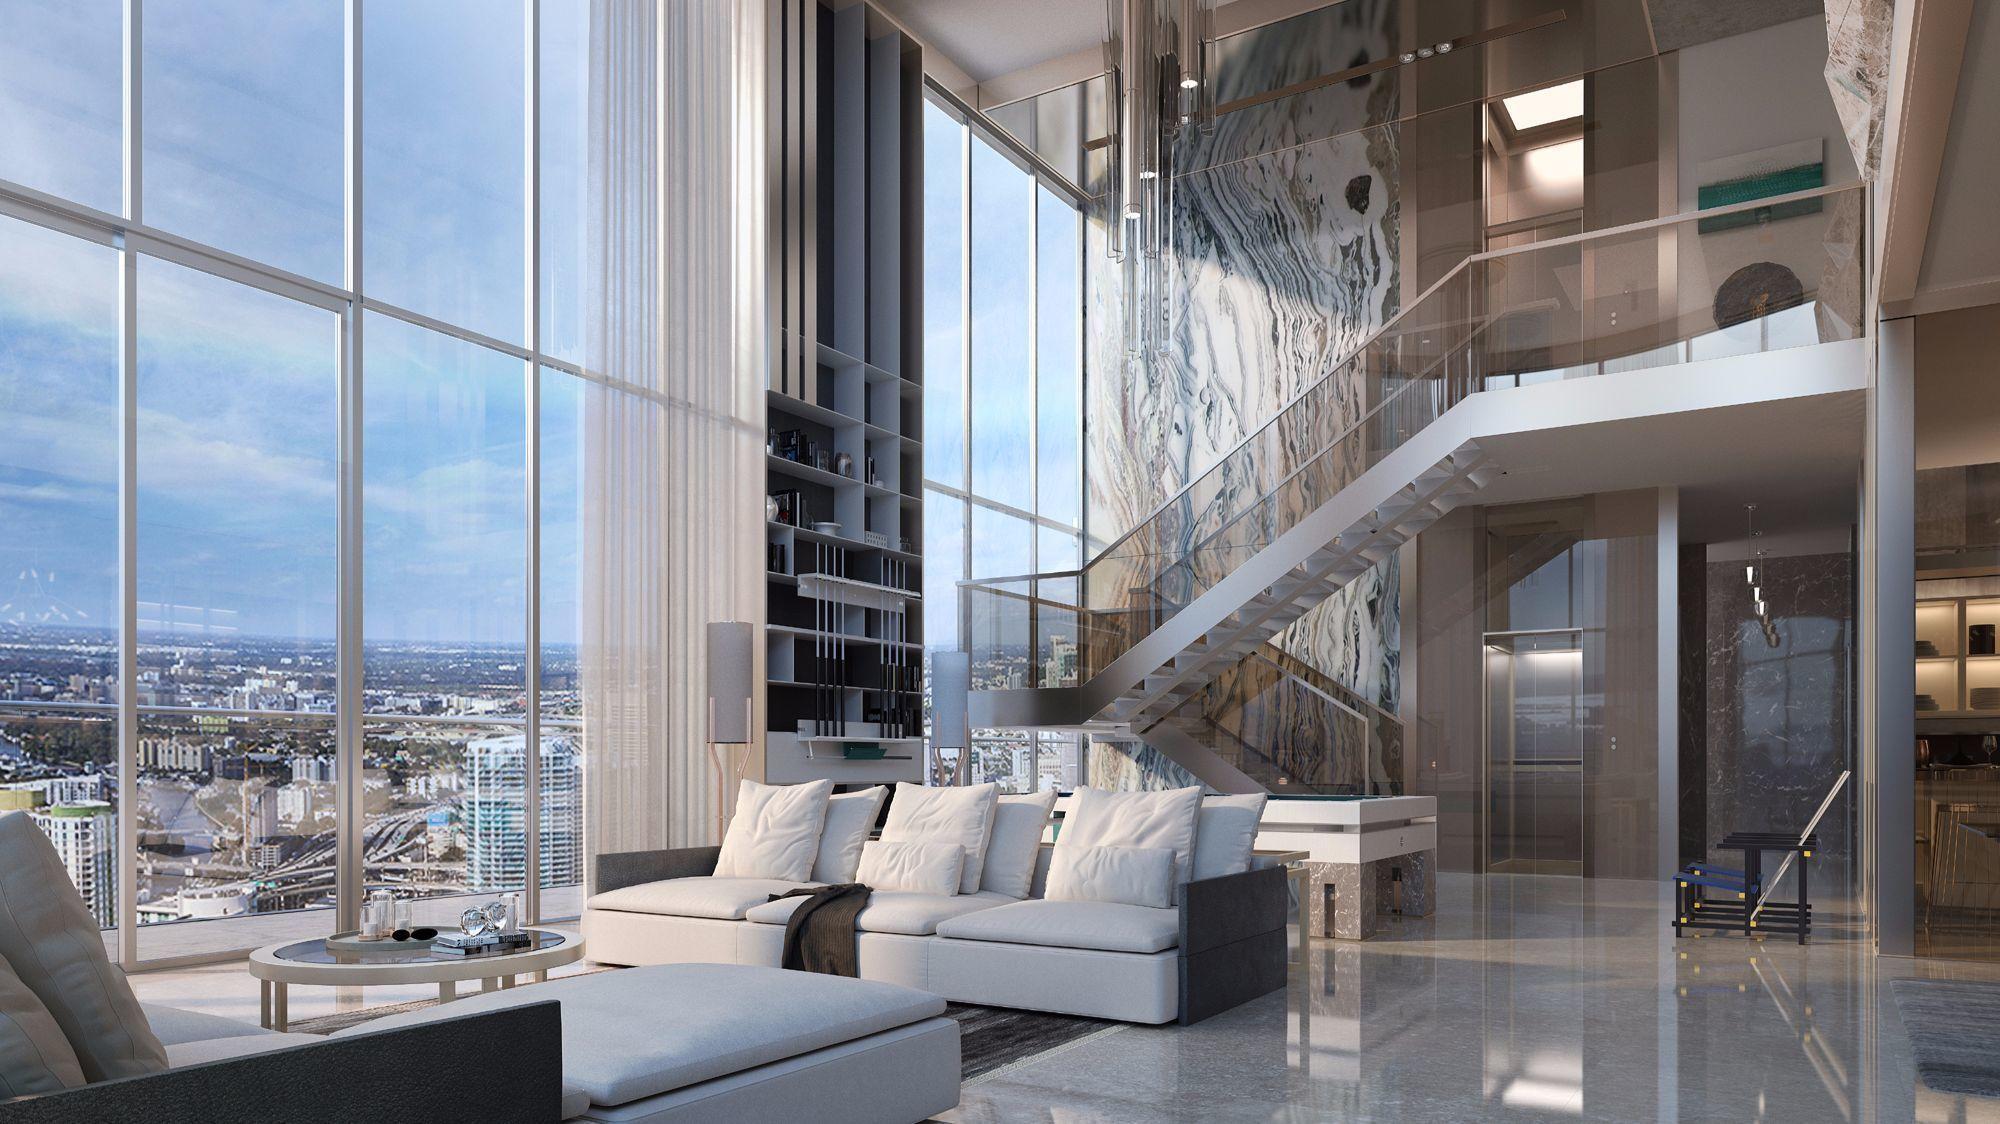 Downtown miami s brickell flatiron unveils penthouse collection